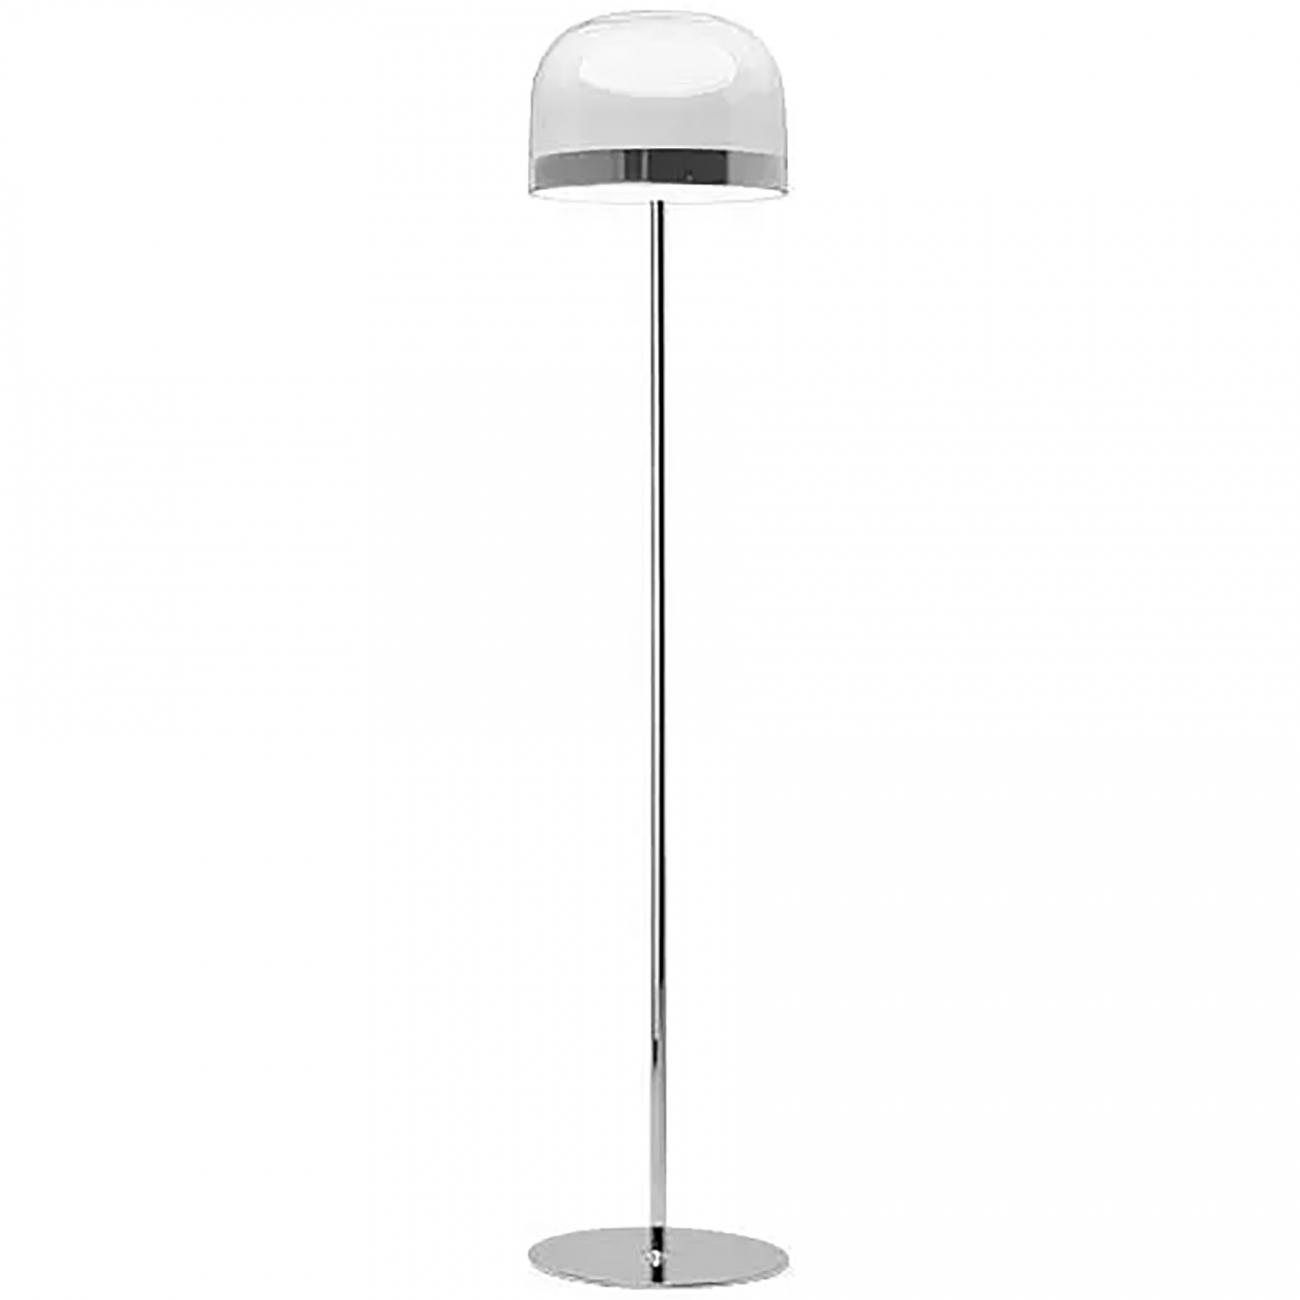 FontanaArte EQUATORE medium floor lamp